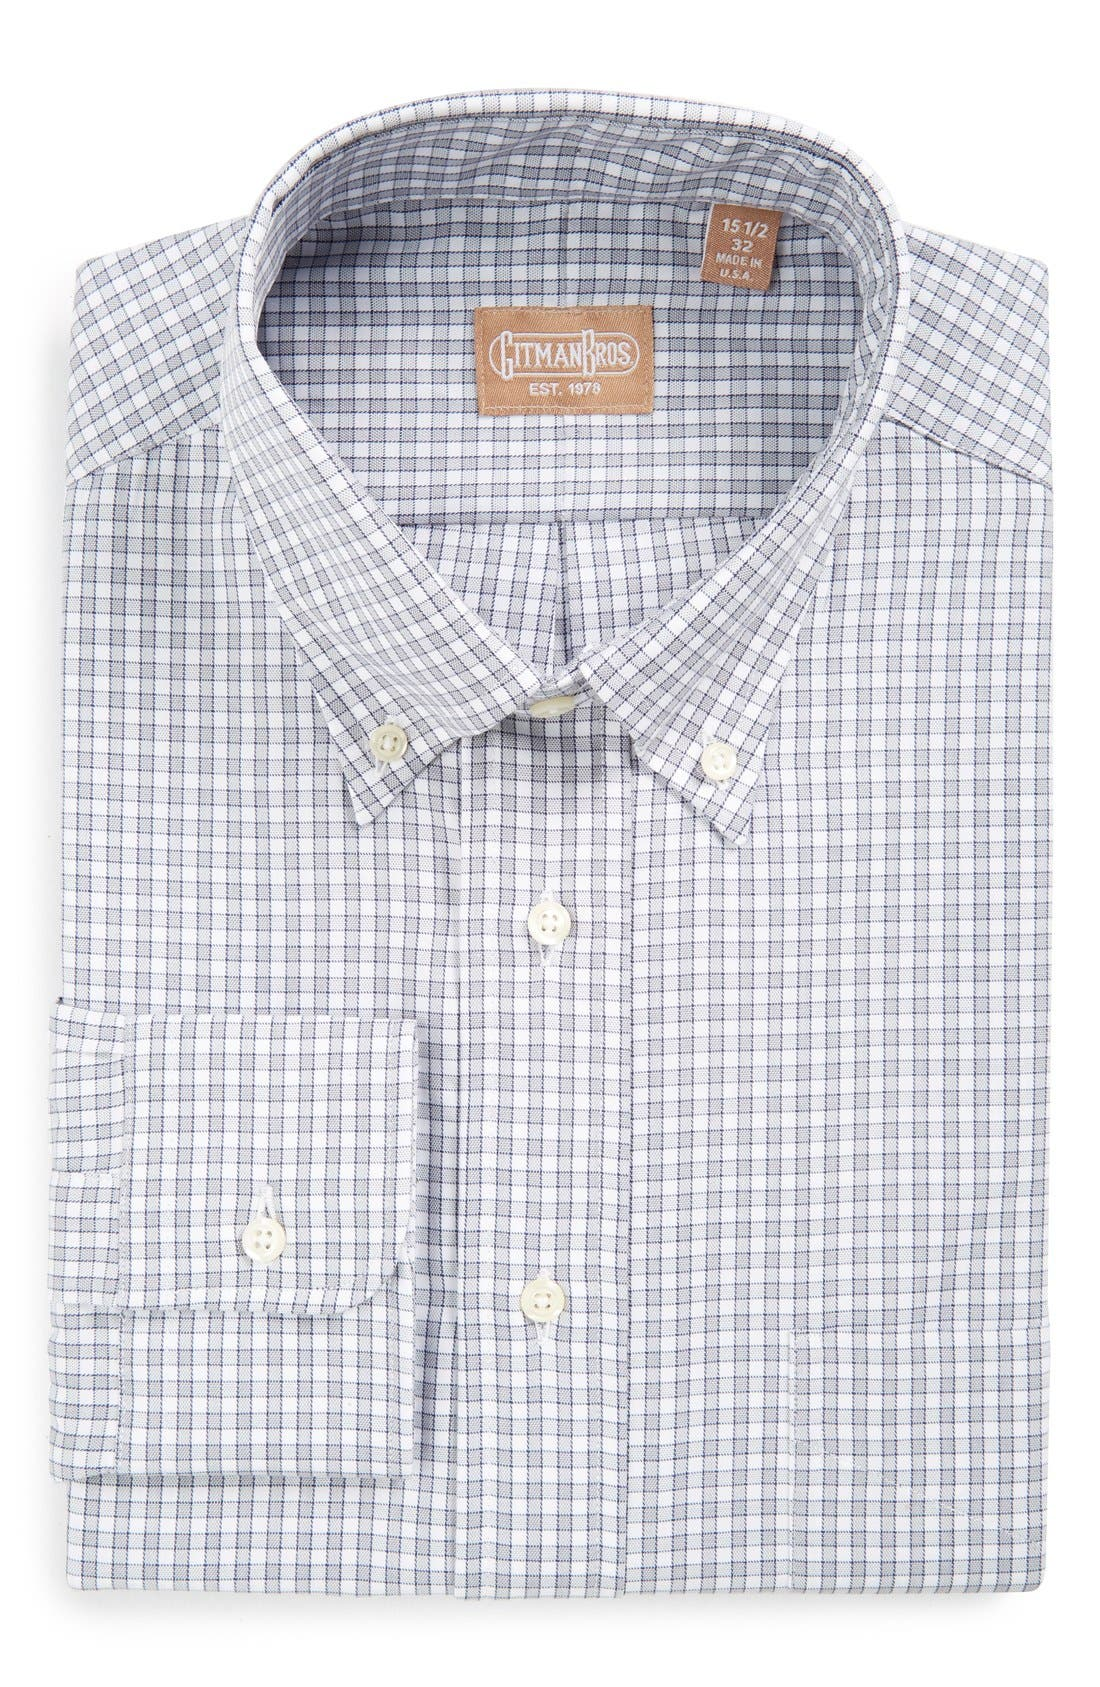 Regular Fit Gingham Check Dress Shirt,                         Main,                         color, 020